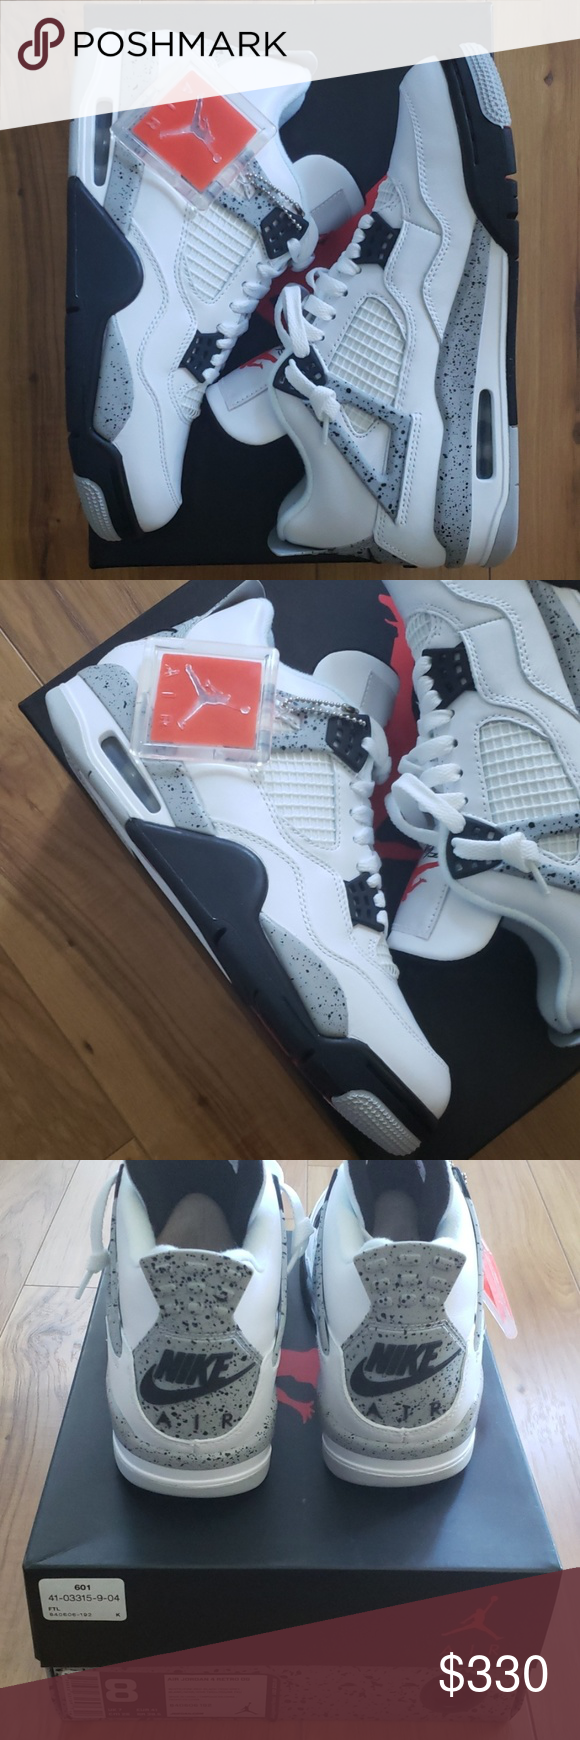 326152f4 Air Jordan 4 Retro OG Cement (2016) Air Jordan 4 Retro OG Cement ...